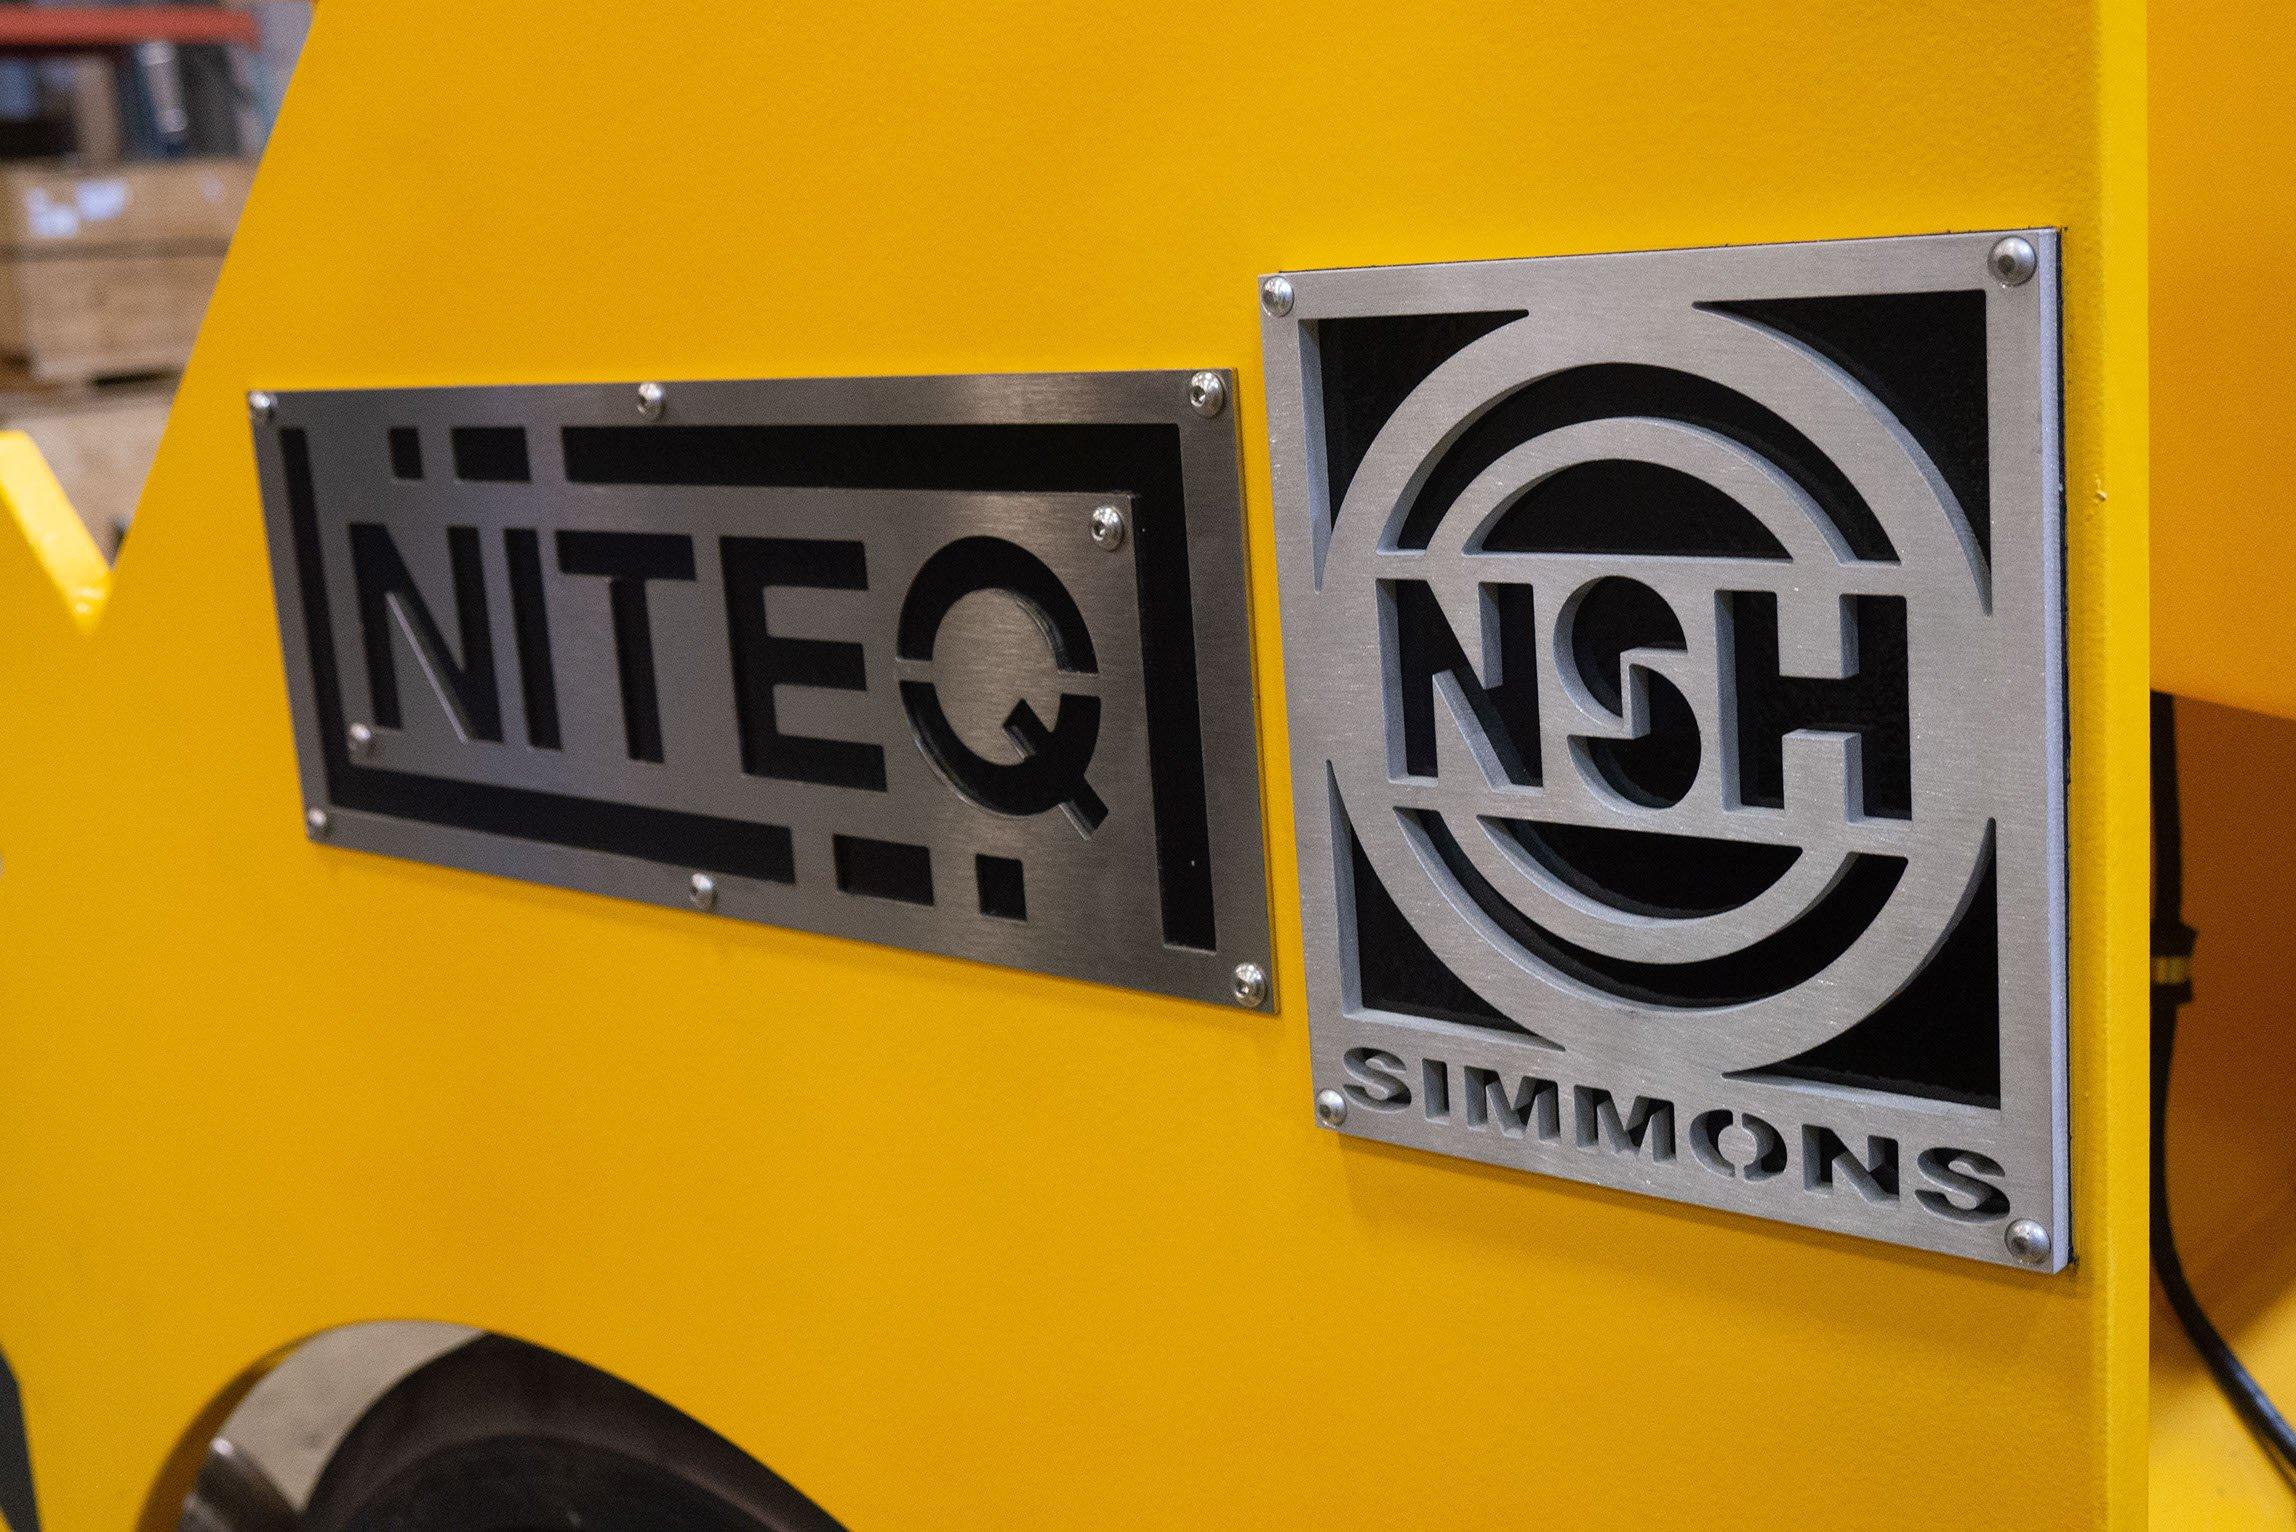 Railway shunting vehicle by Niteq